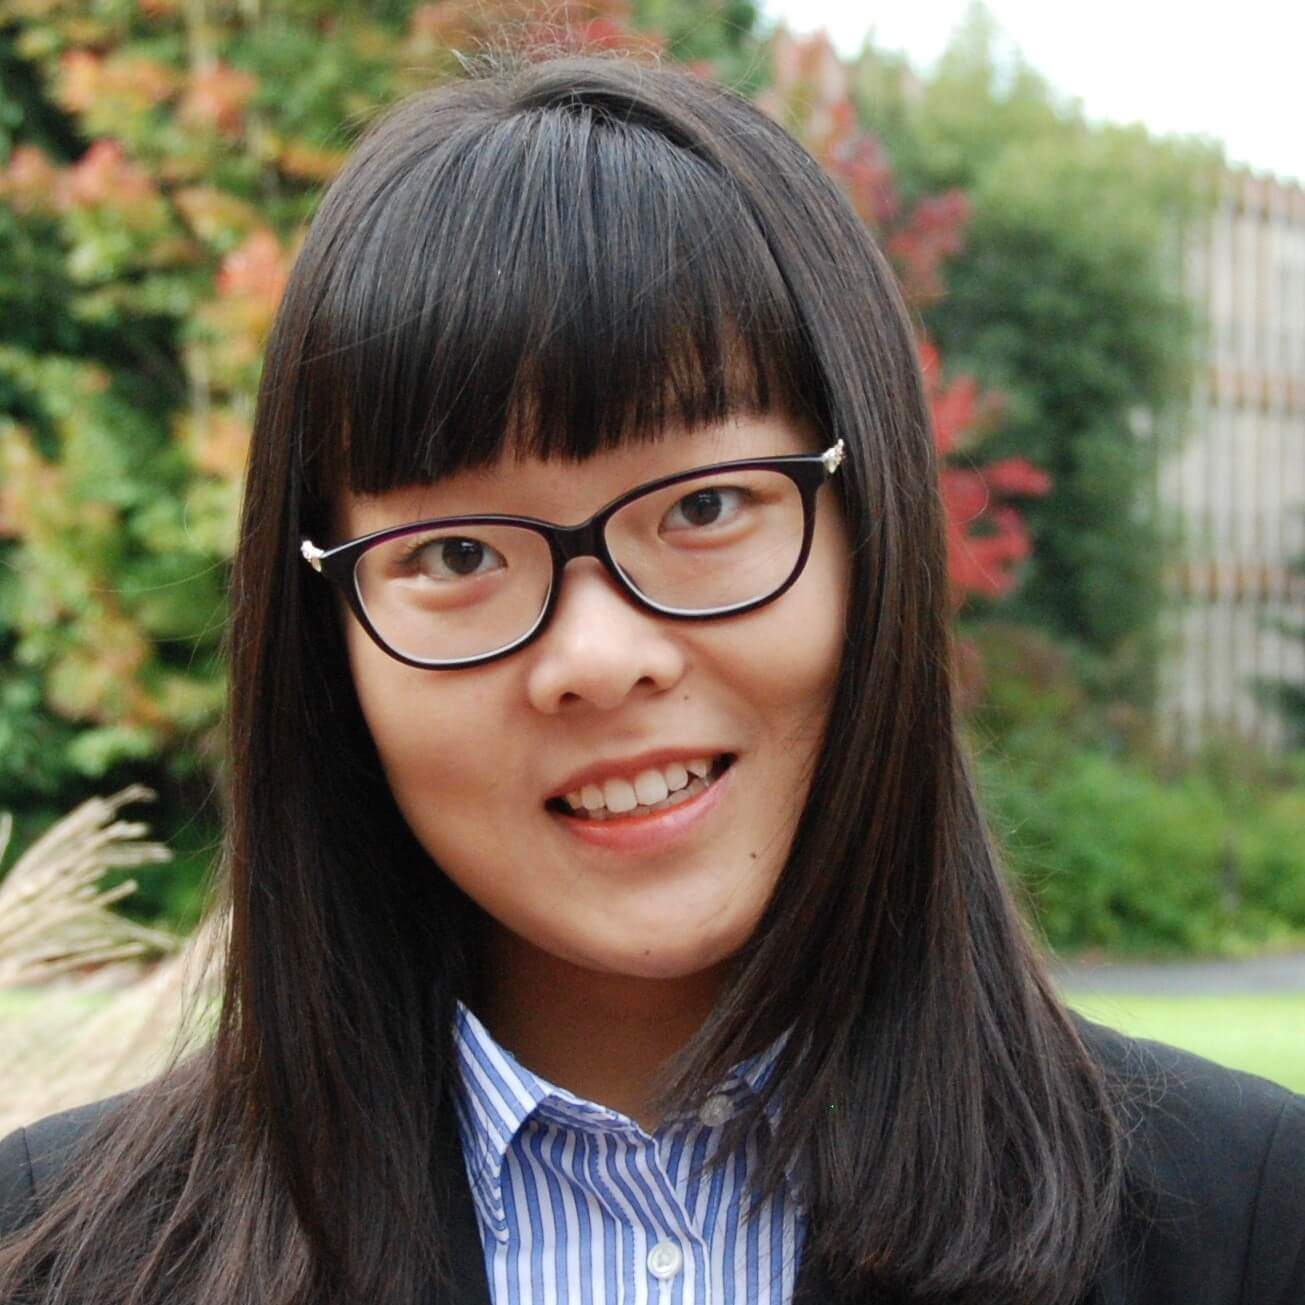 Danyi Guan : Graduate Student